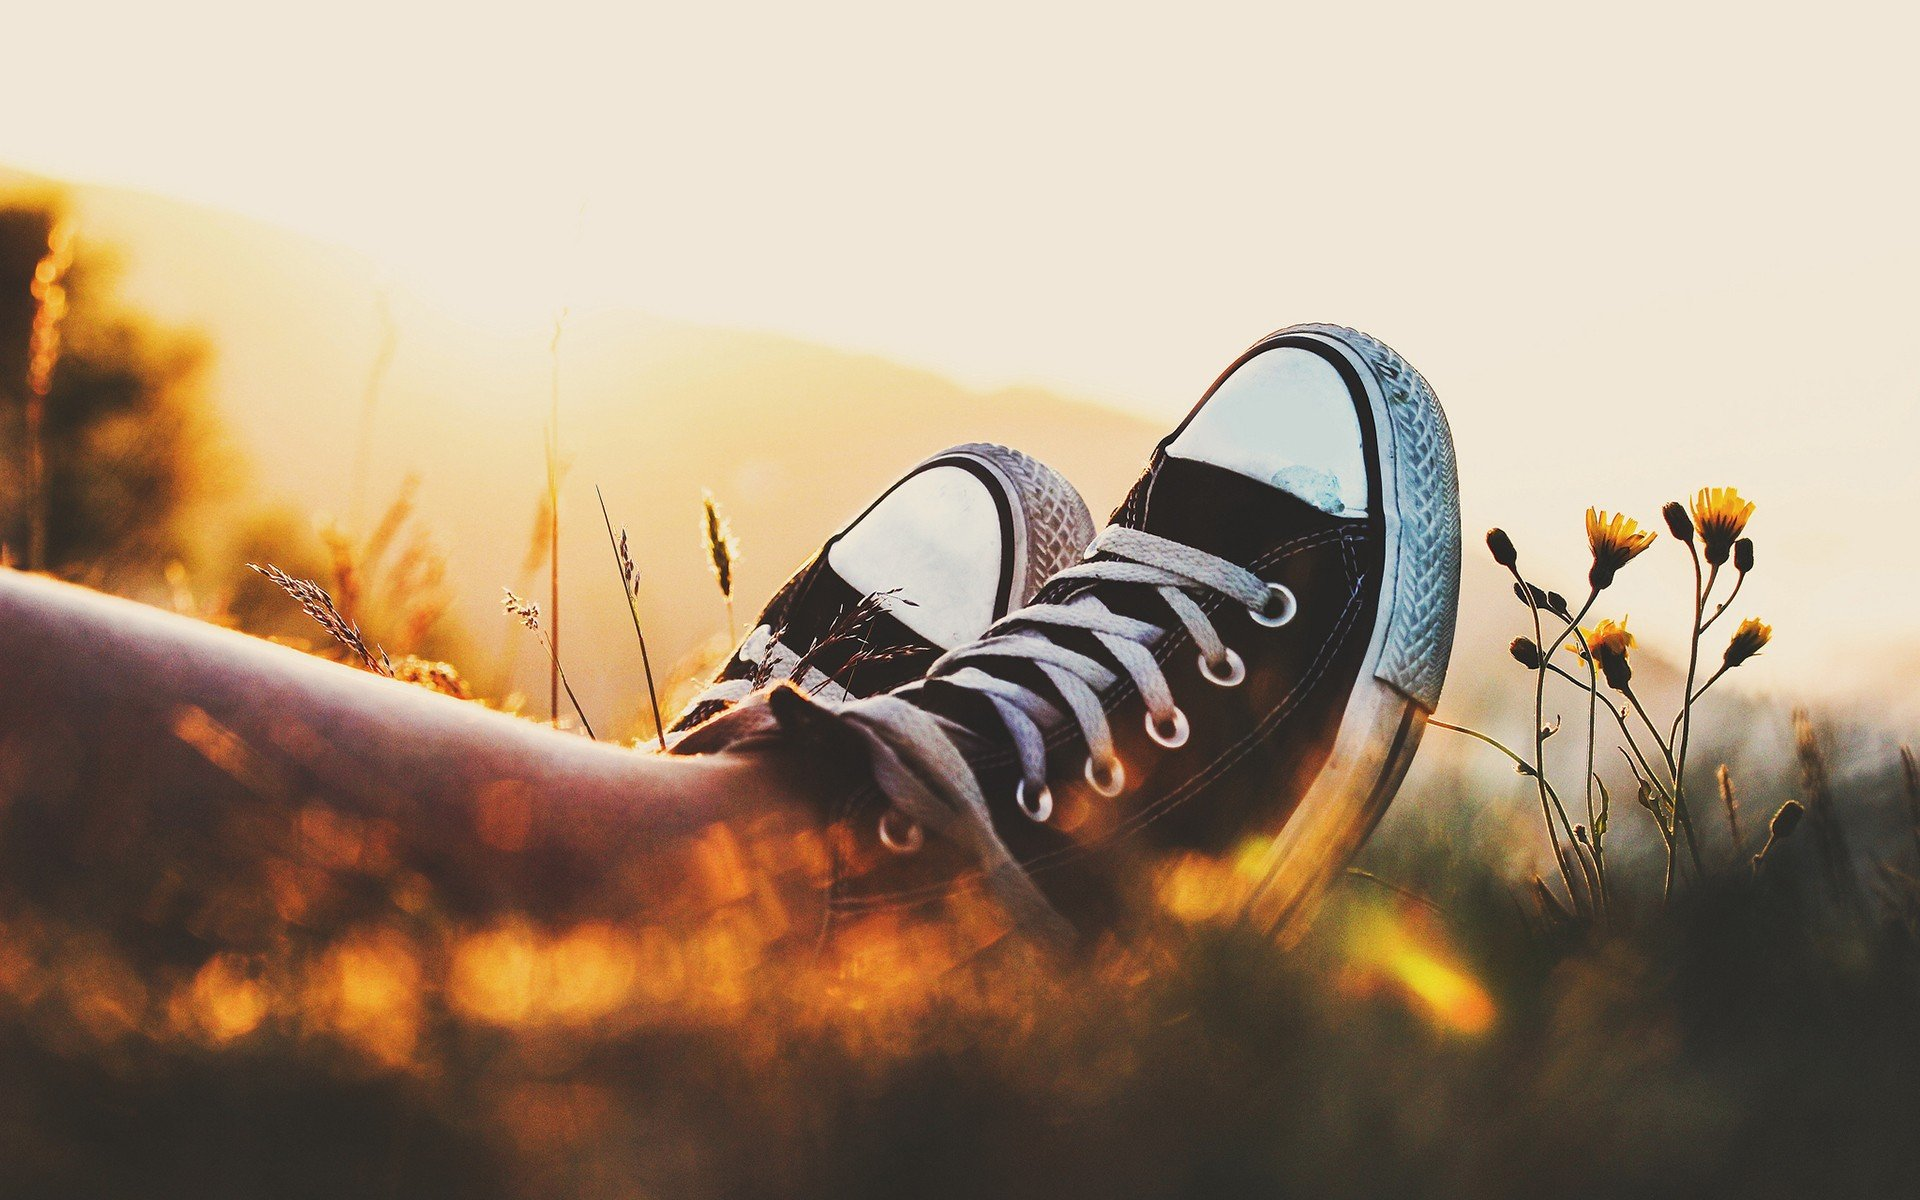 legs summer shoes plants converse bokeh sunlight depth of